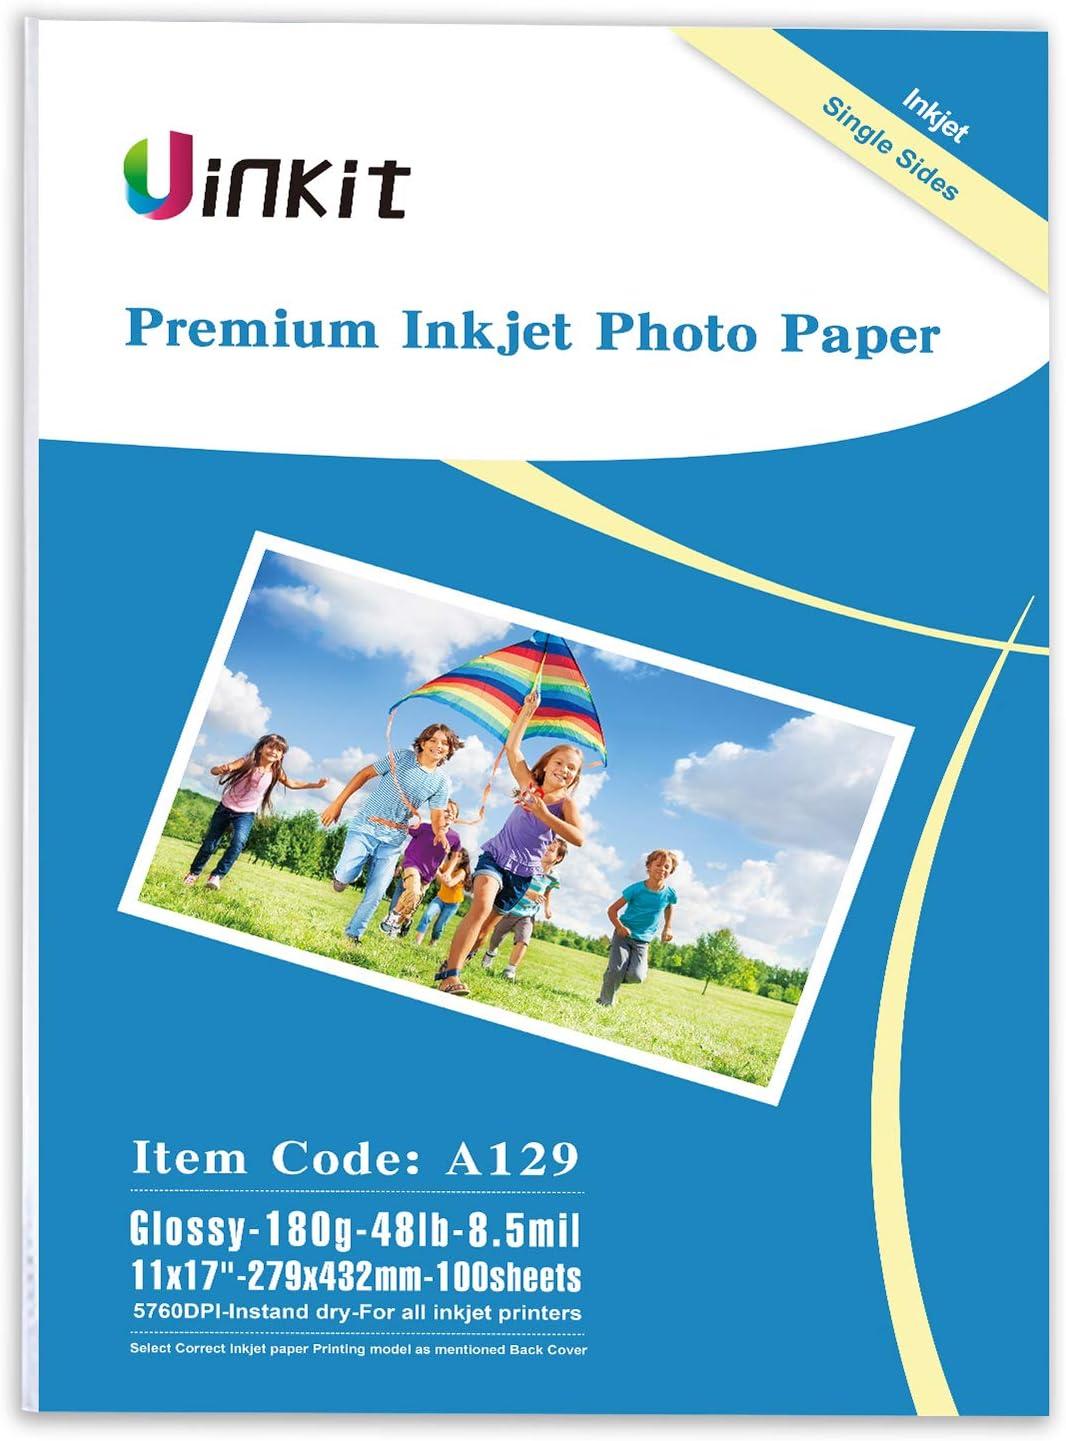 Glossy Photo Paper 11 x 17 - 100 sheets Uinkit Single side Inkje